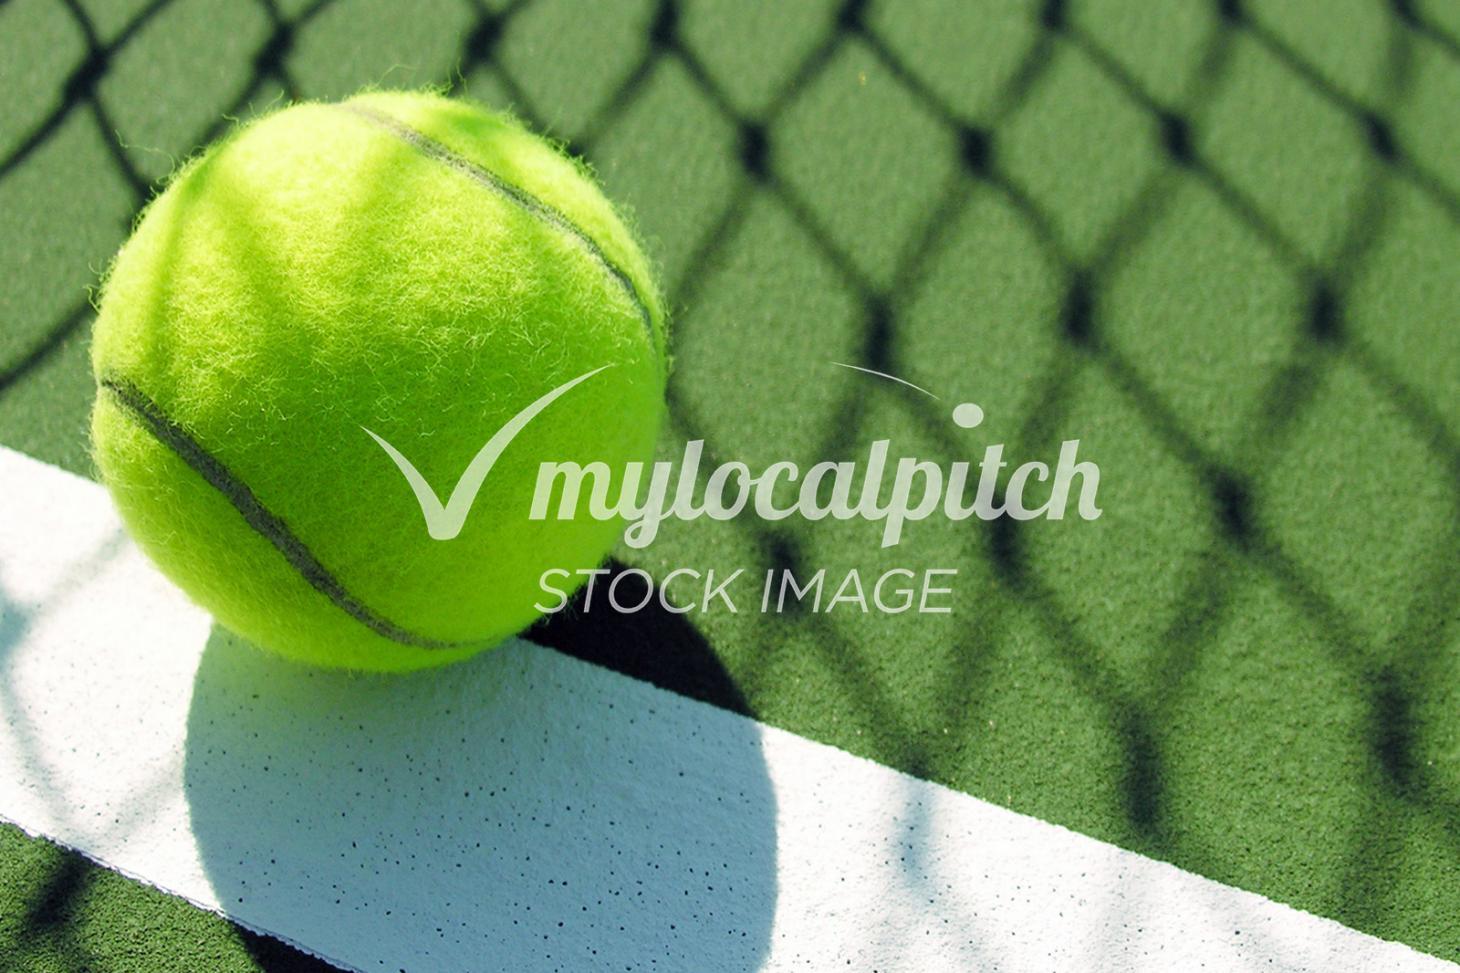 Challney High School for Girls Outdoor | Concrete tennis court